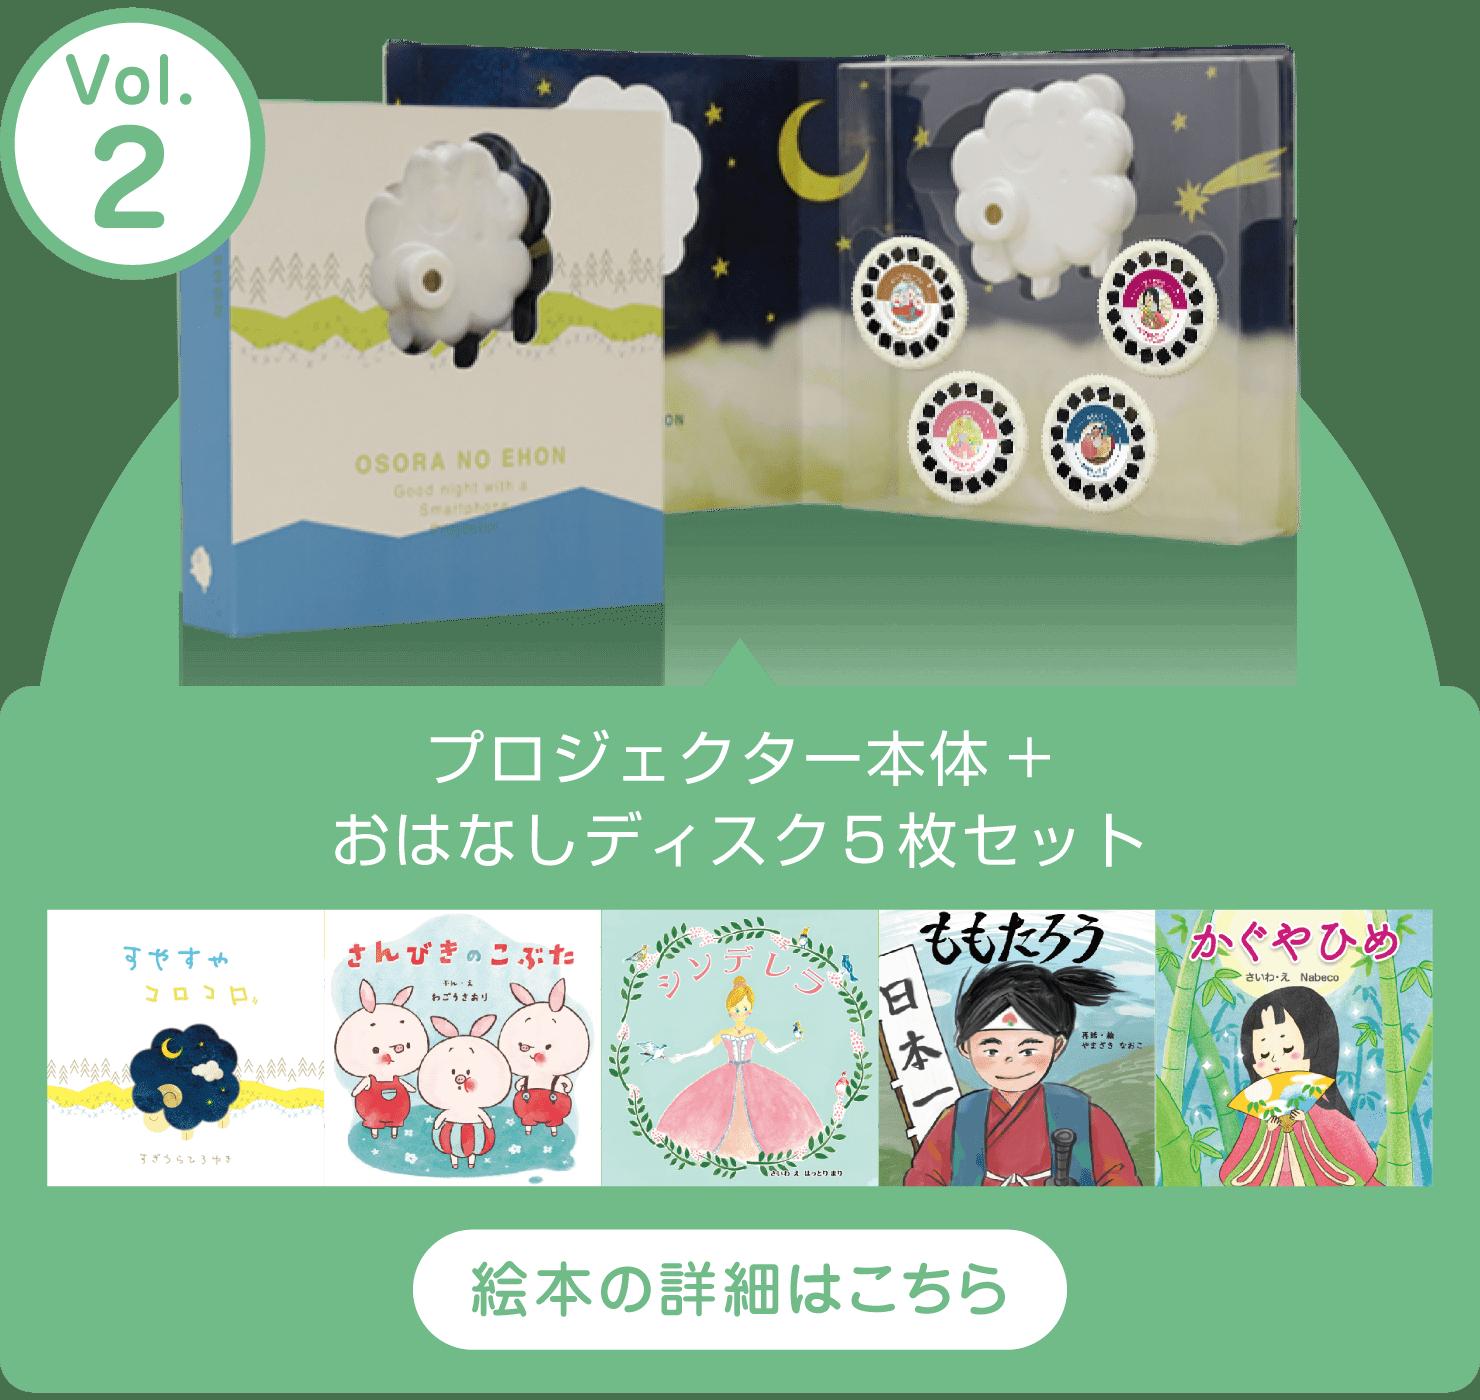 https://osora-no-ehon.oyakonojikanlabo.jp/wp/wp-content/themes/osora-no-ehon/products/collection-box/b3-2